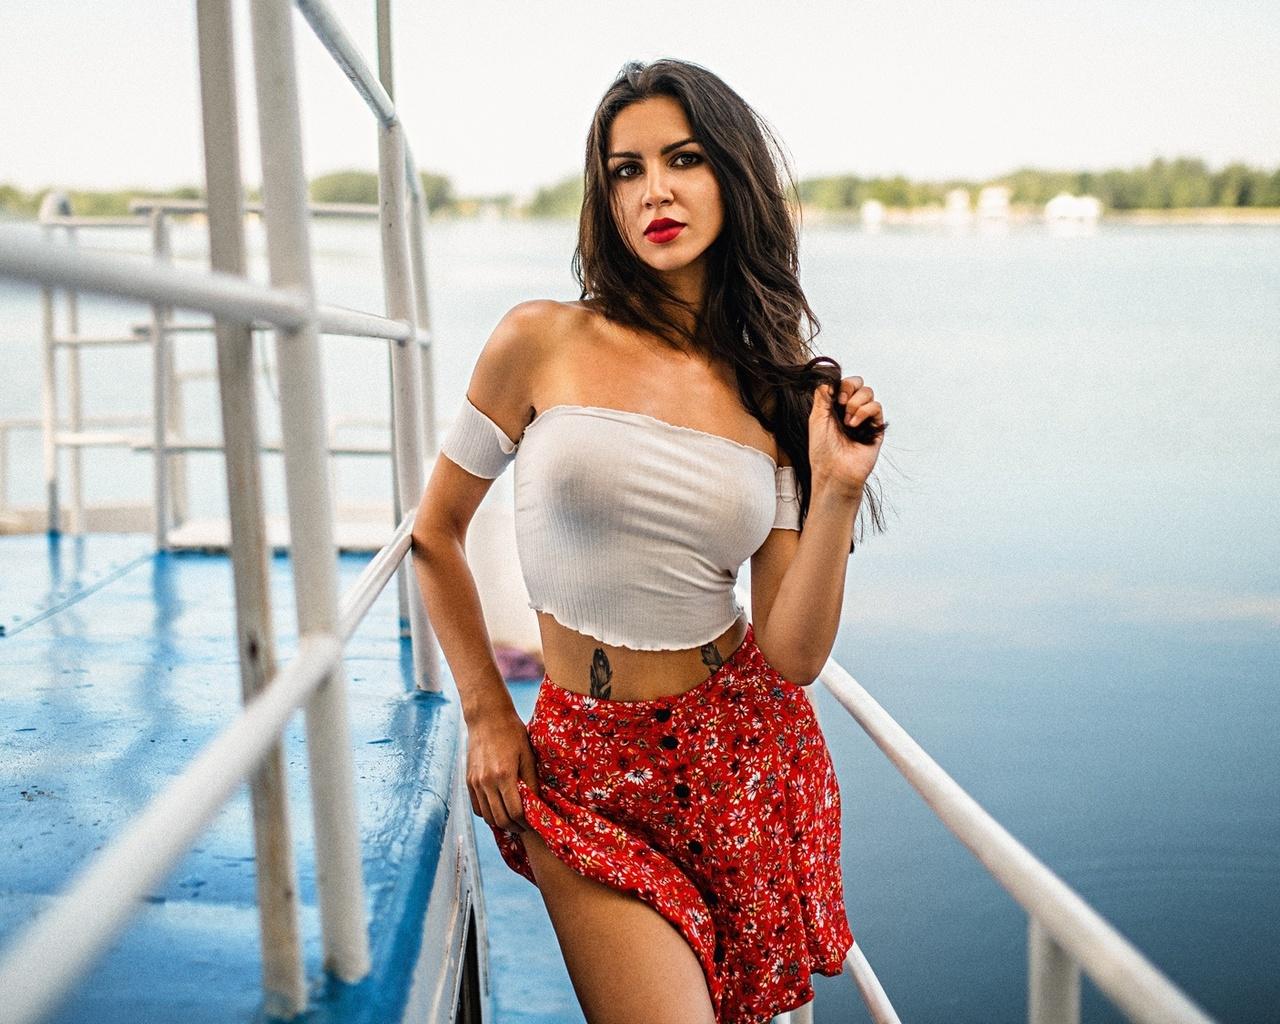 women, tattoo, portrait, skirt, red lipstick, long hair, women outdoors, bare shoulders, water, boat